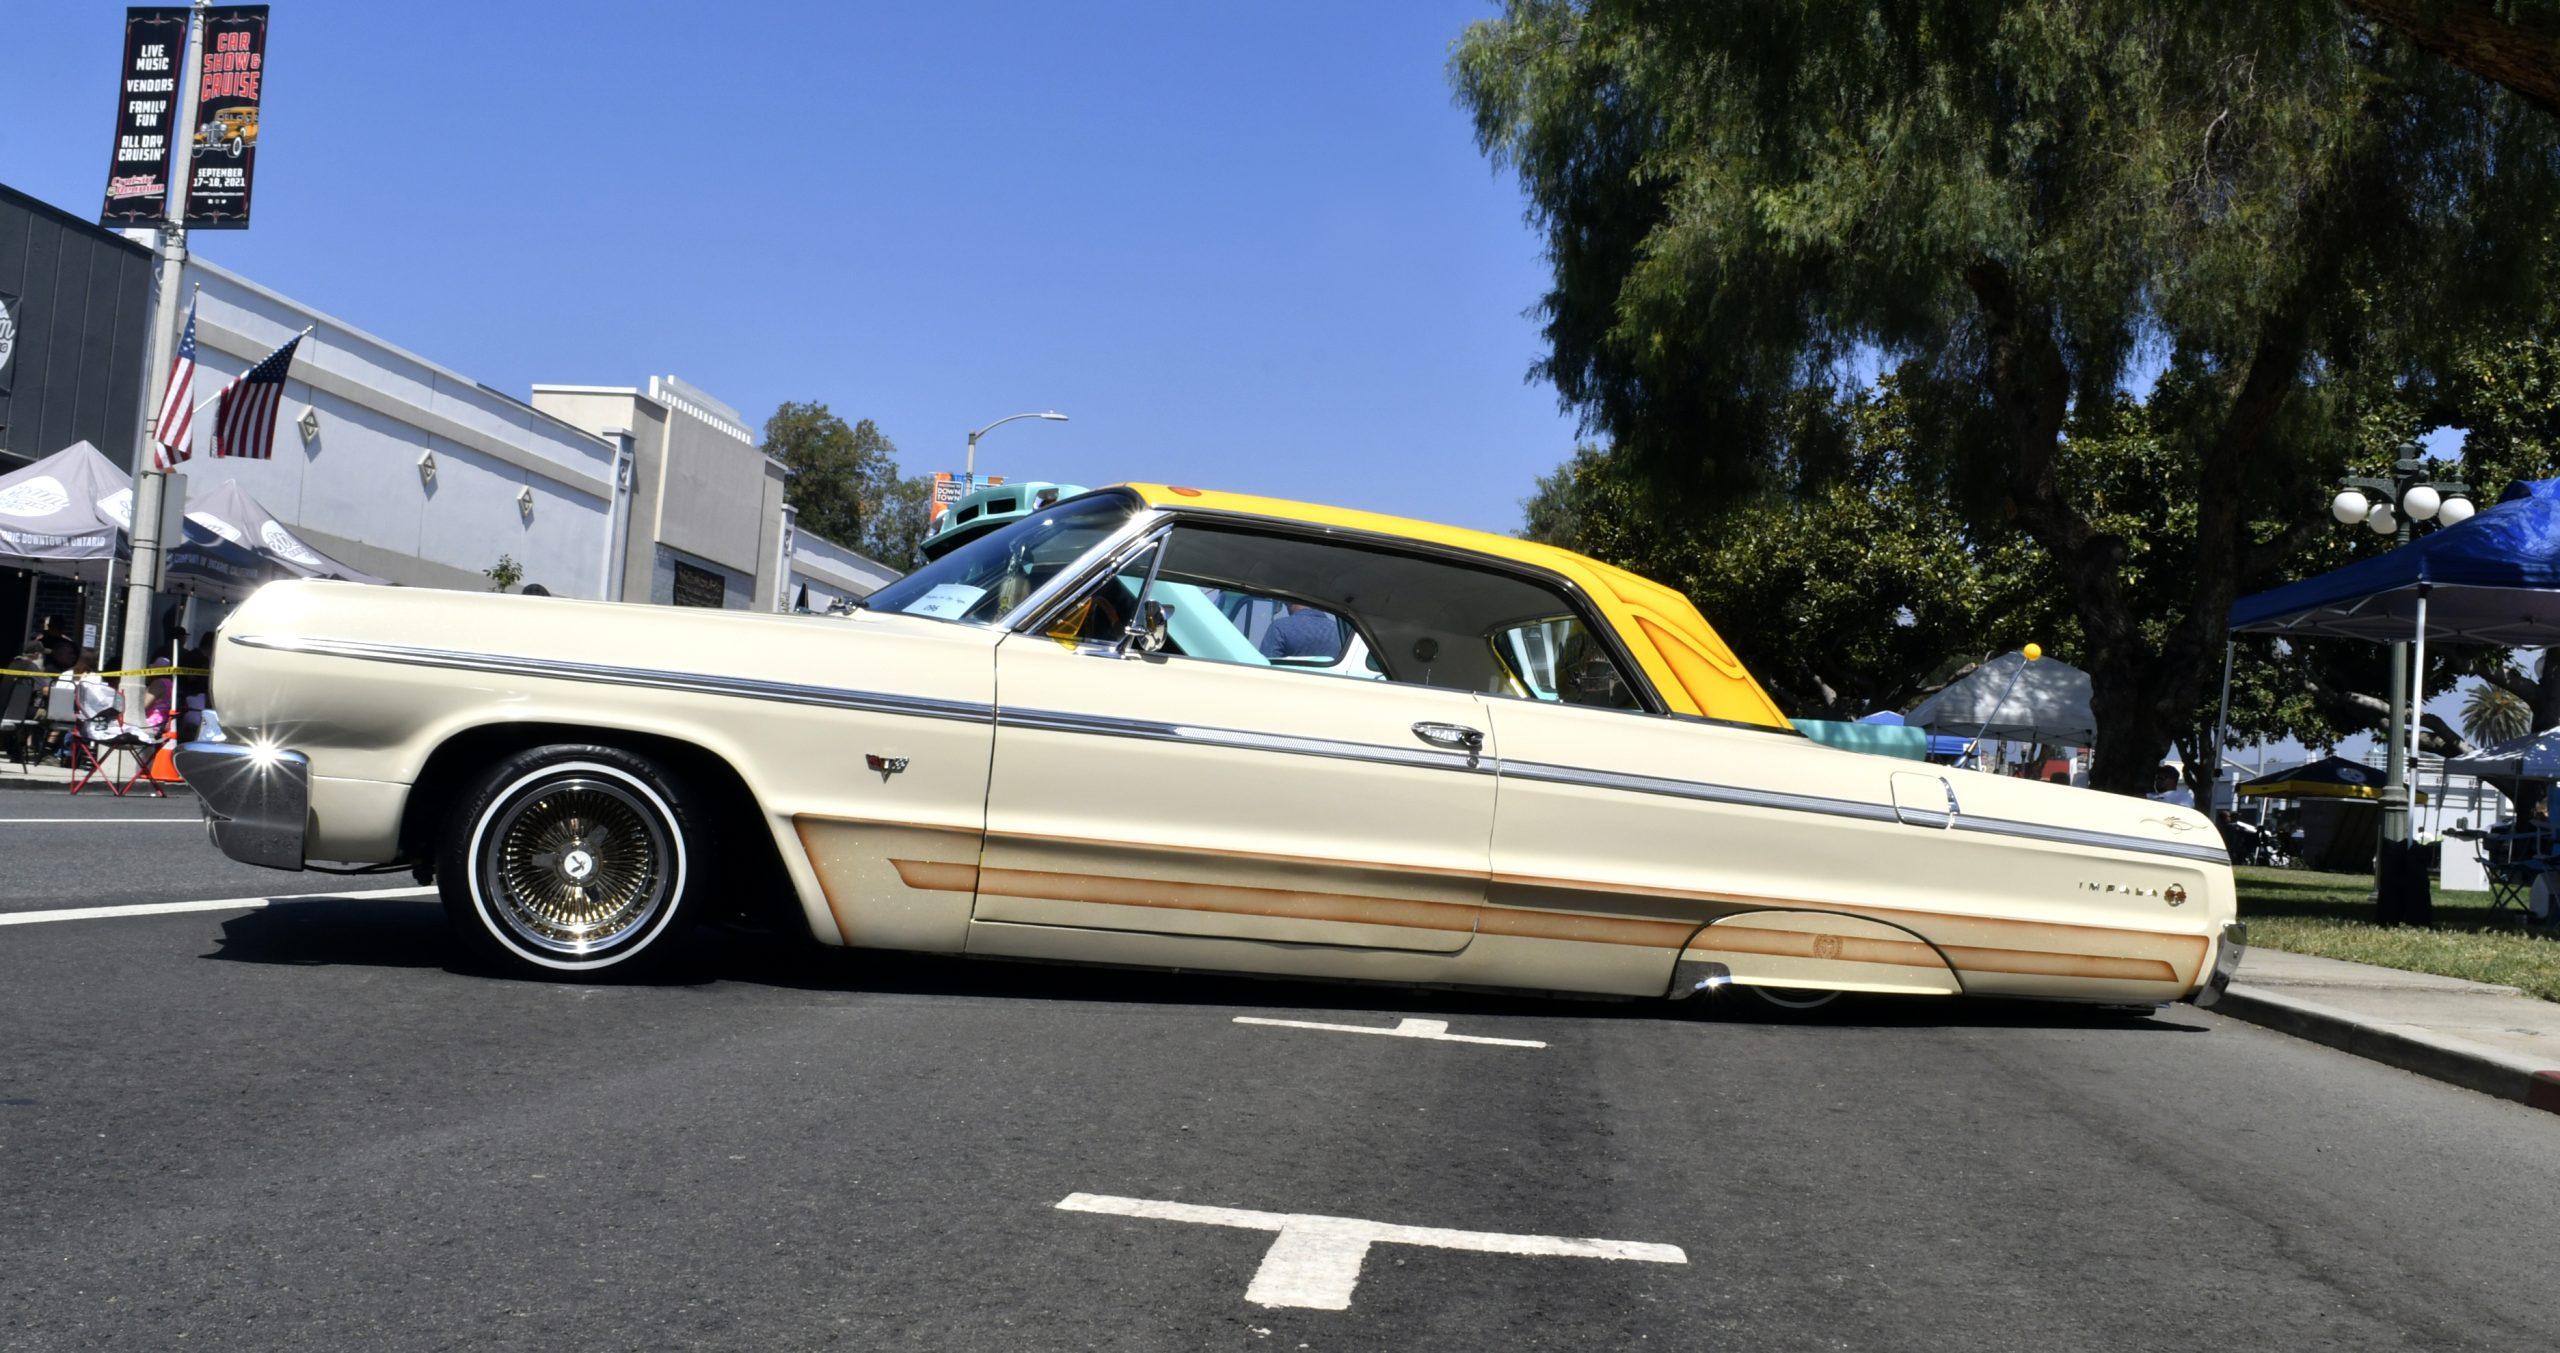 Route 66 Reunion impala low rider